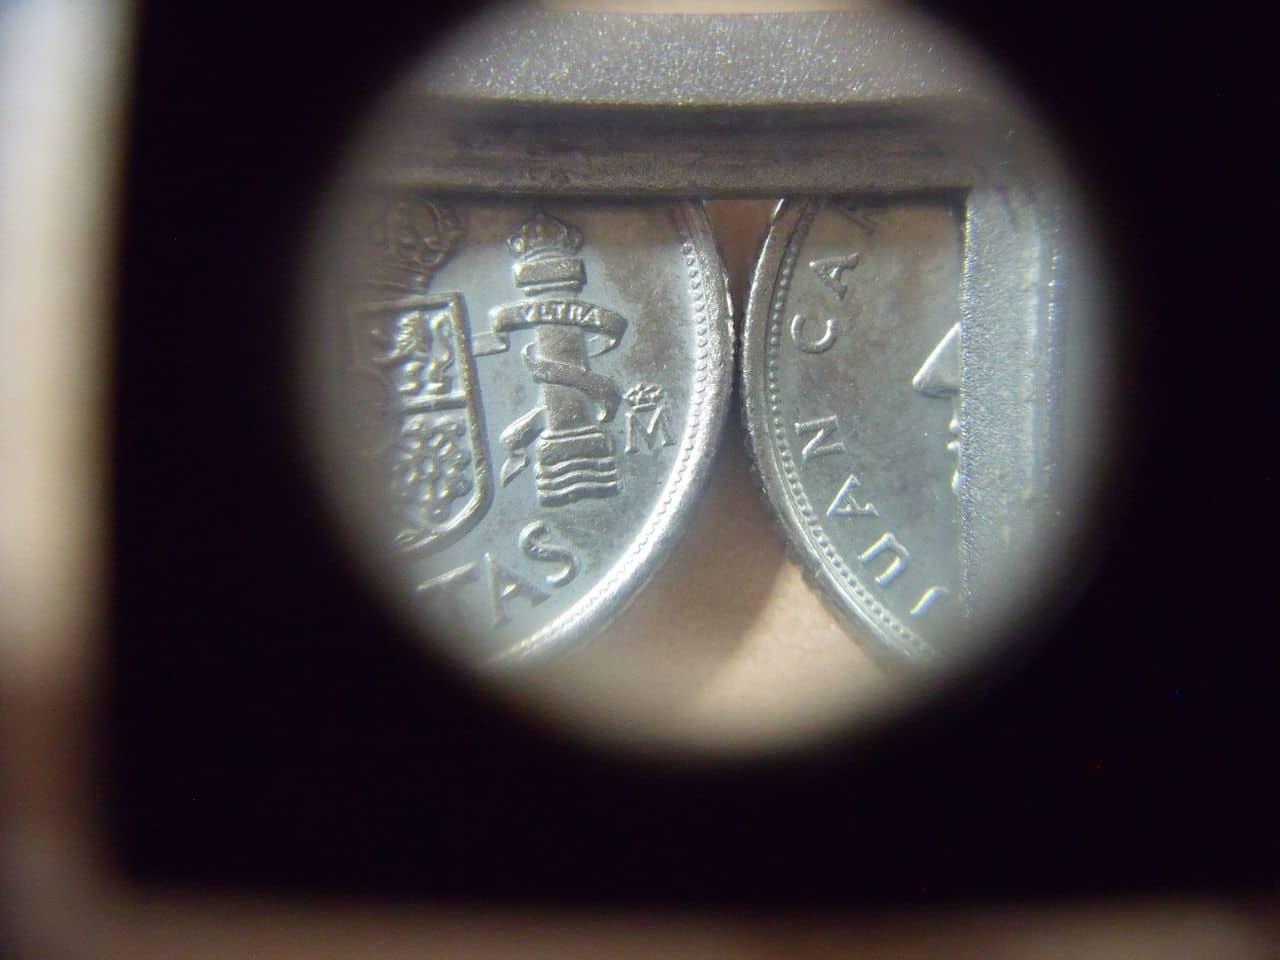 M coronada 10 Ptas. 1984 M_coronada_10_Ptas_1984_010